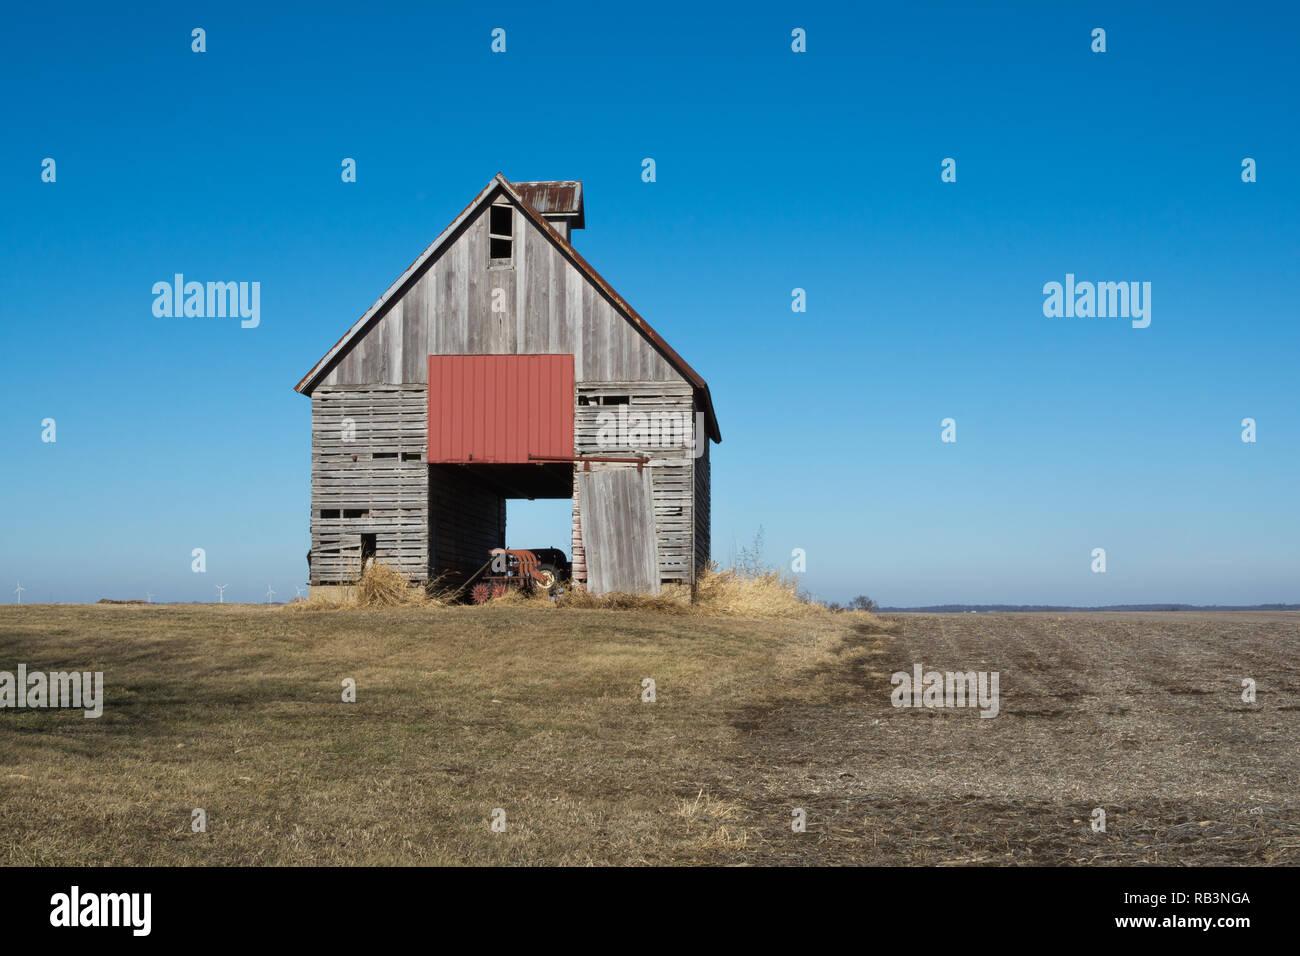 Old wooden barn in the rural open farmland.  Illinois, USA Stock Photo